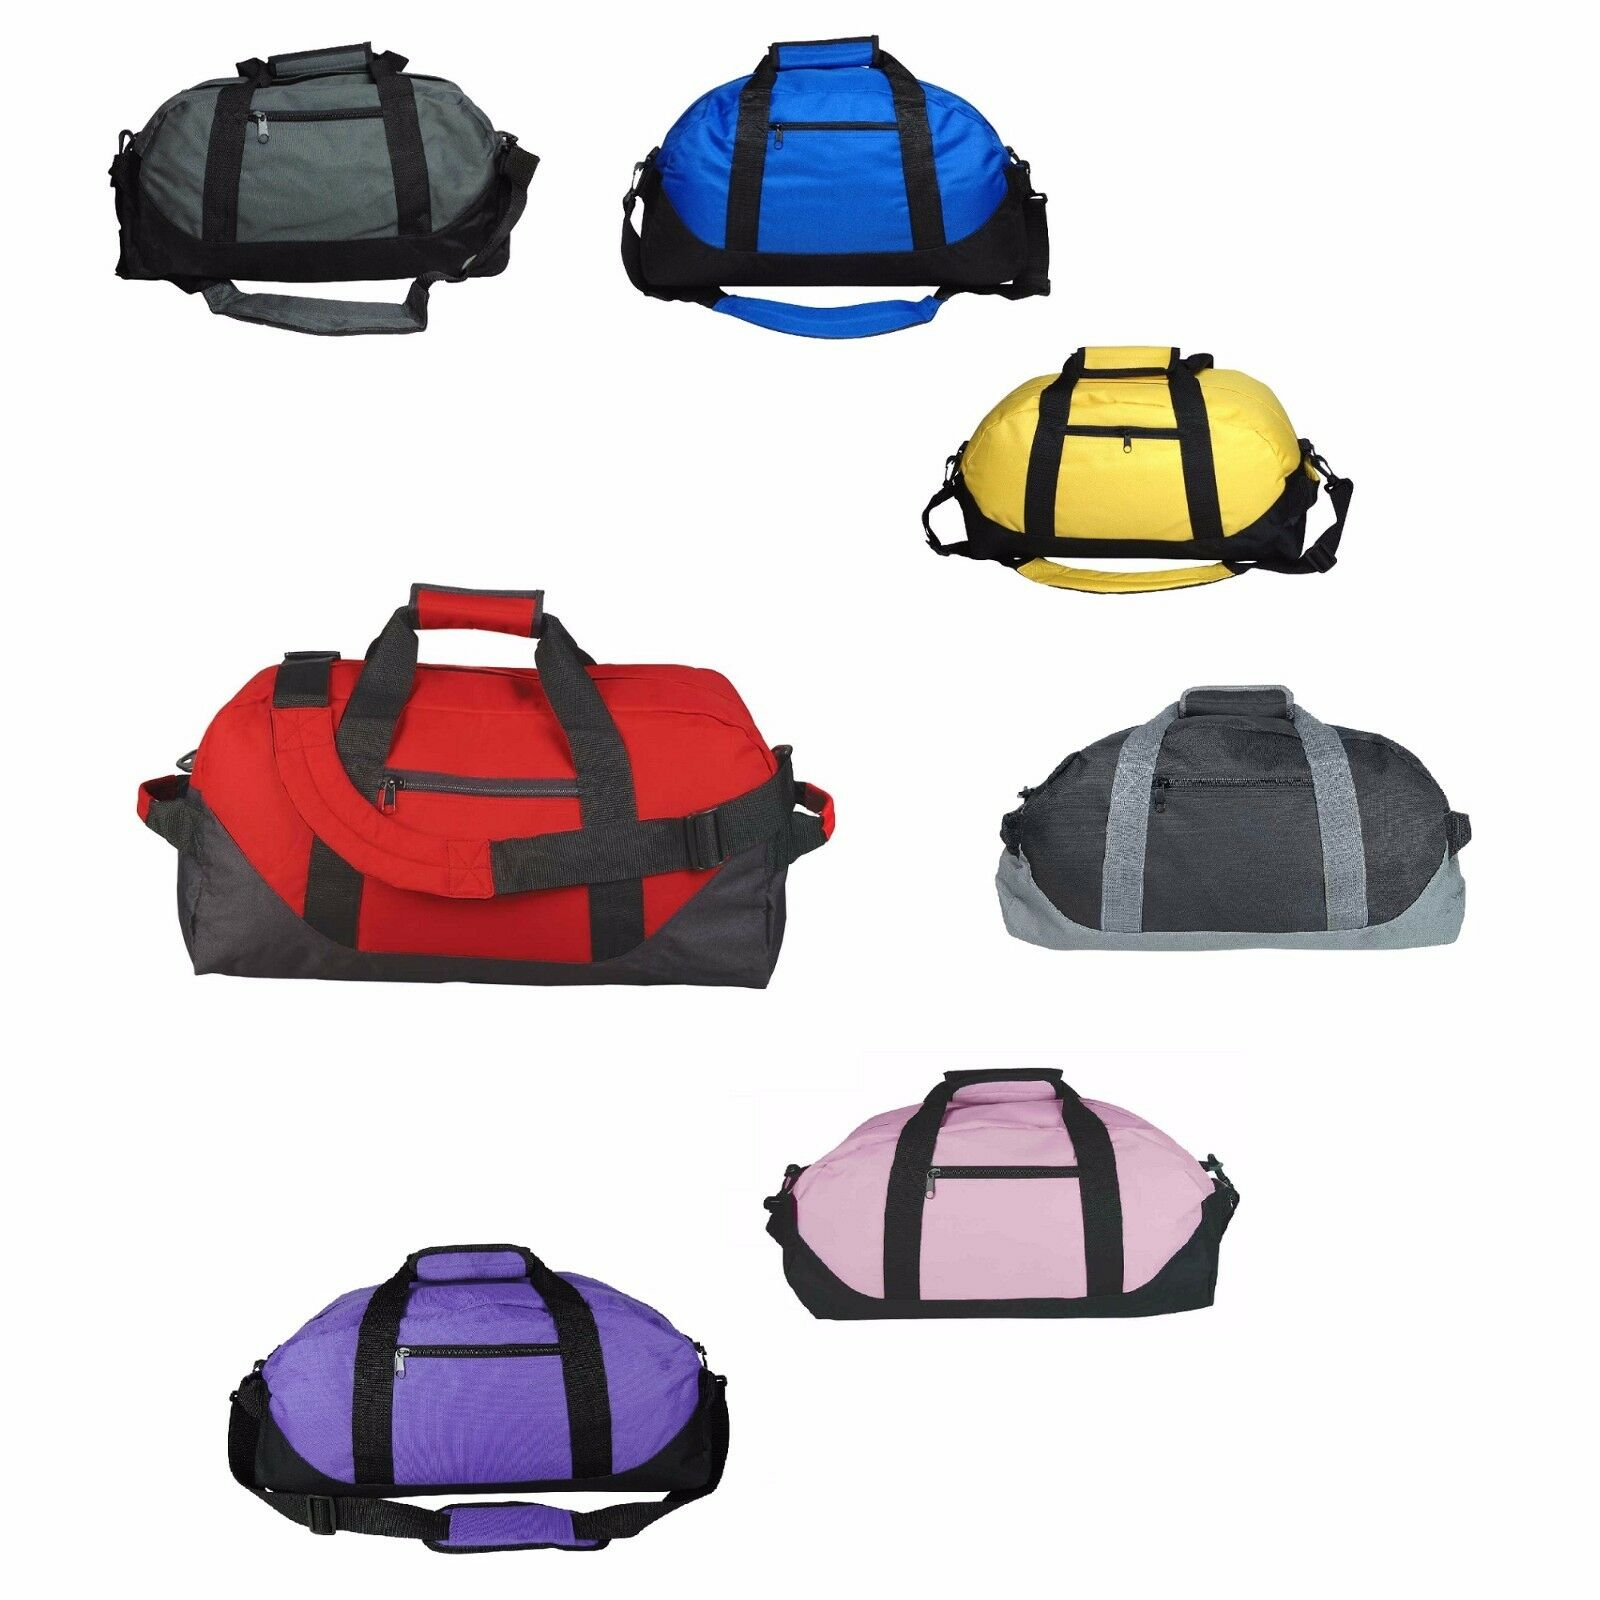 "DALIX 18"" Two Toned Gym Duffle Bag Travel Yoga Medium"